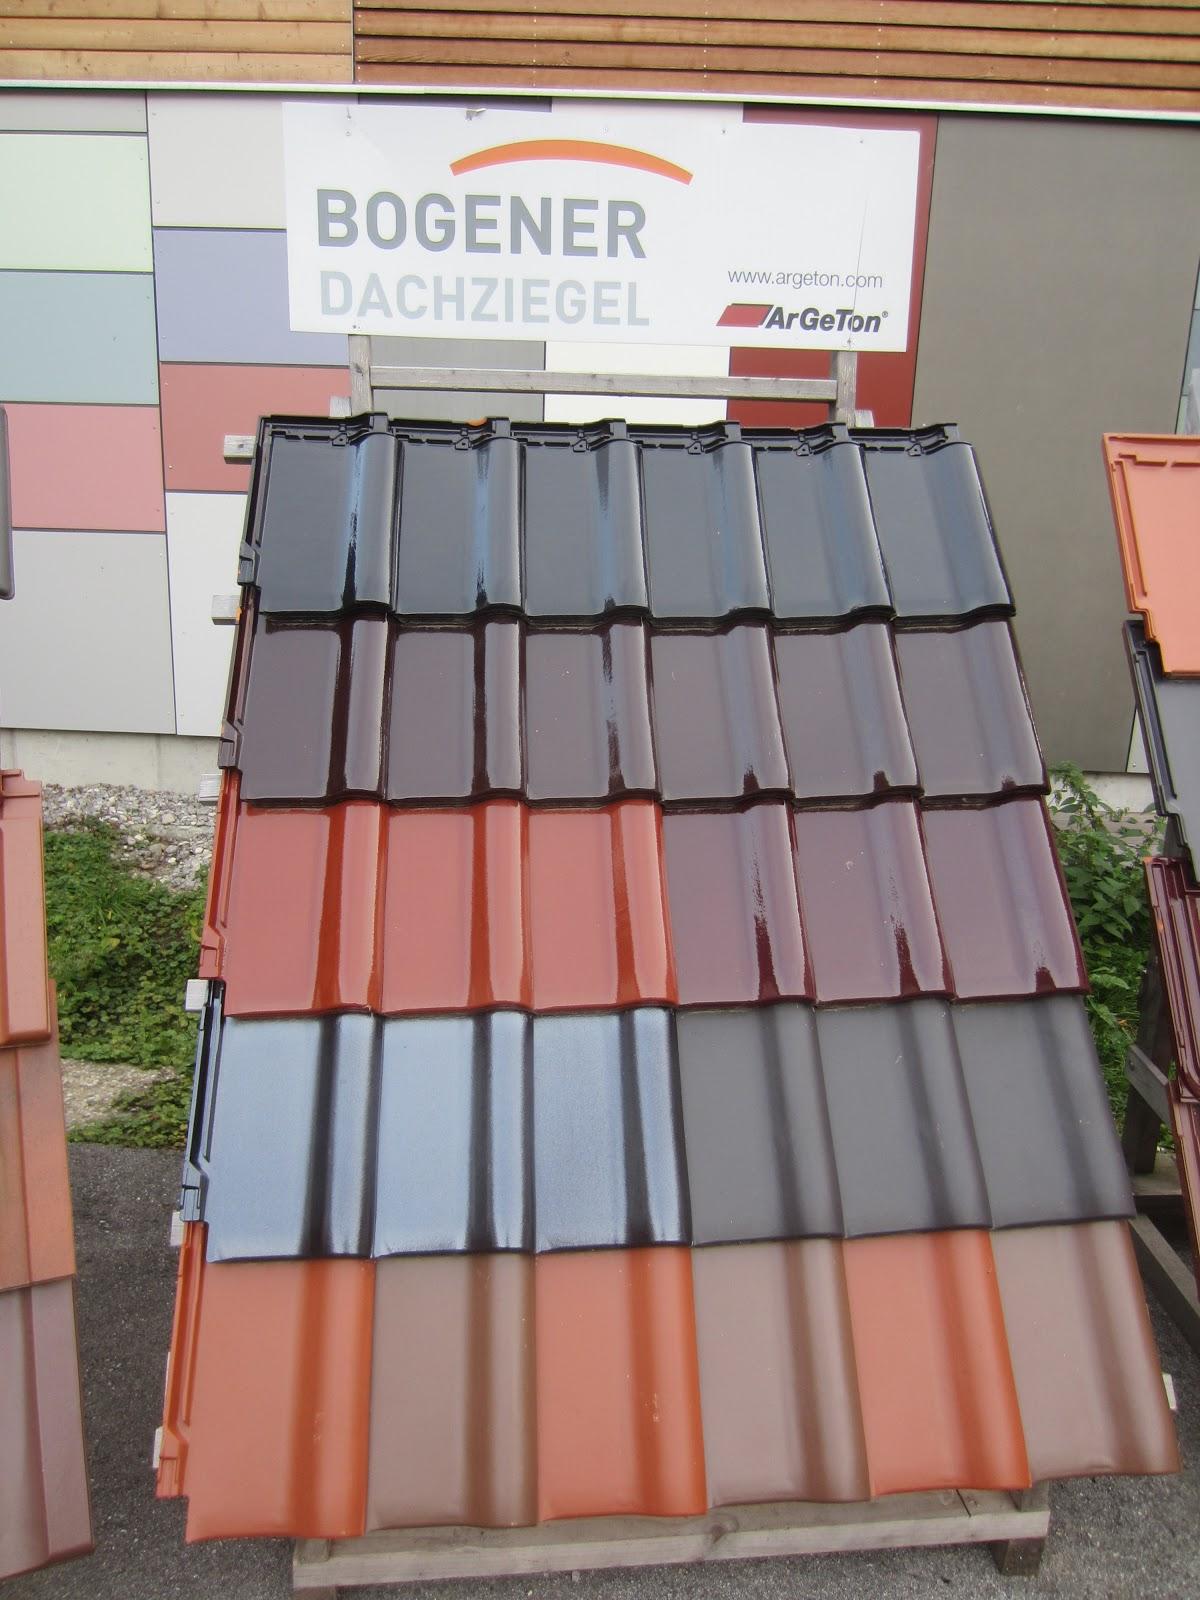 dachziegel farbe dachziegel farben dachziegel farben bersicht dachziegel feriane farbe. Black Bedroom Furniture Sets. Home Design Ideas